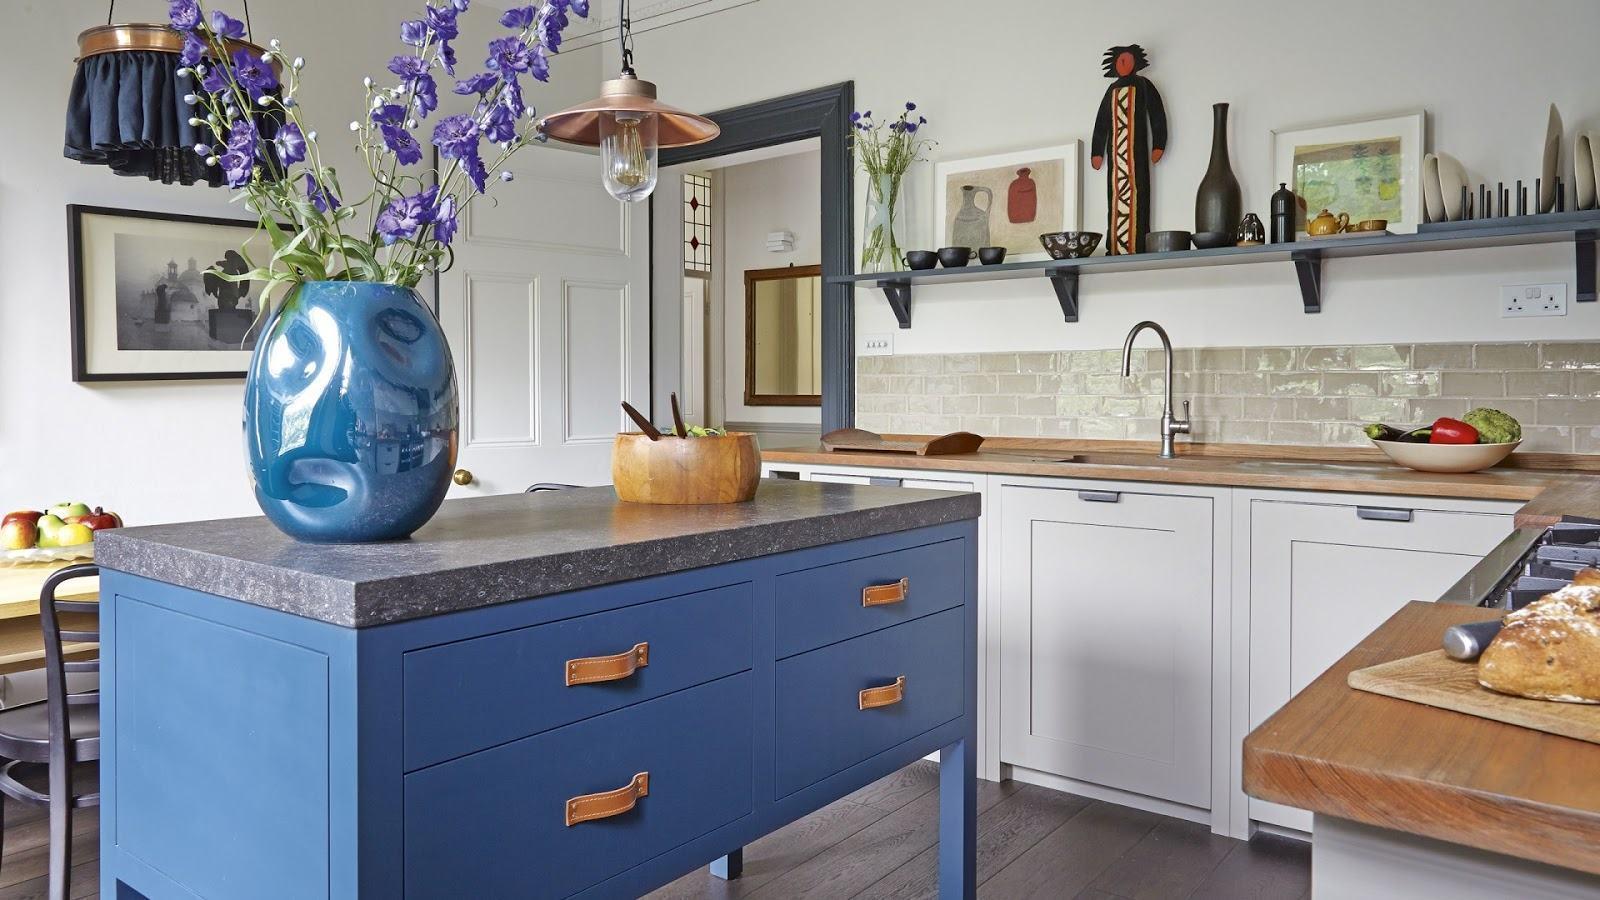 Inove na escolha dos puxadores na cozinha azul